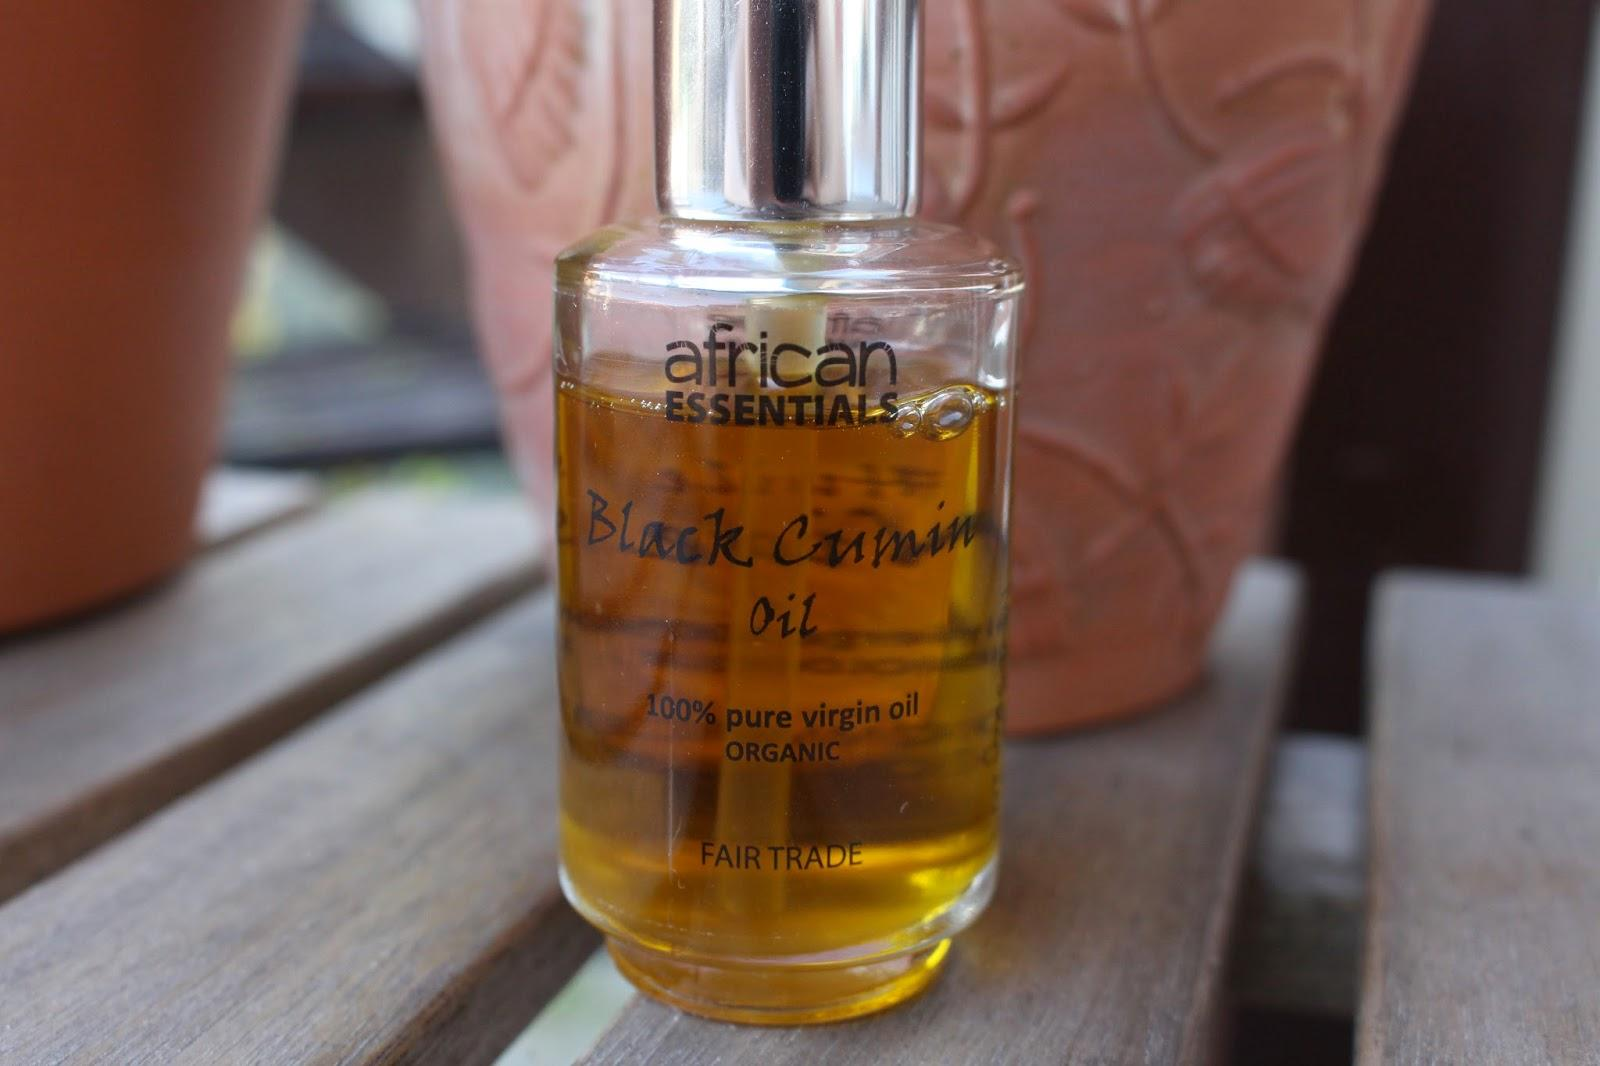 L'huile de nigelle de Afrique Essentials (Black cumin seed oil)